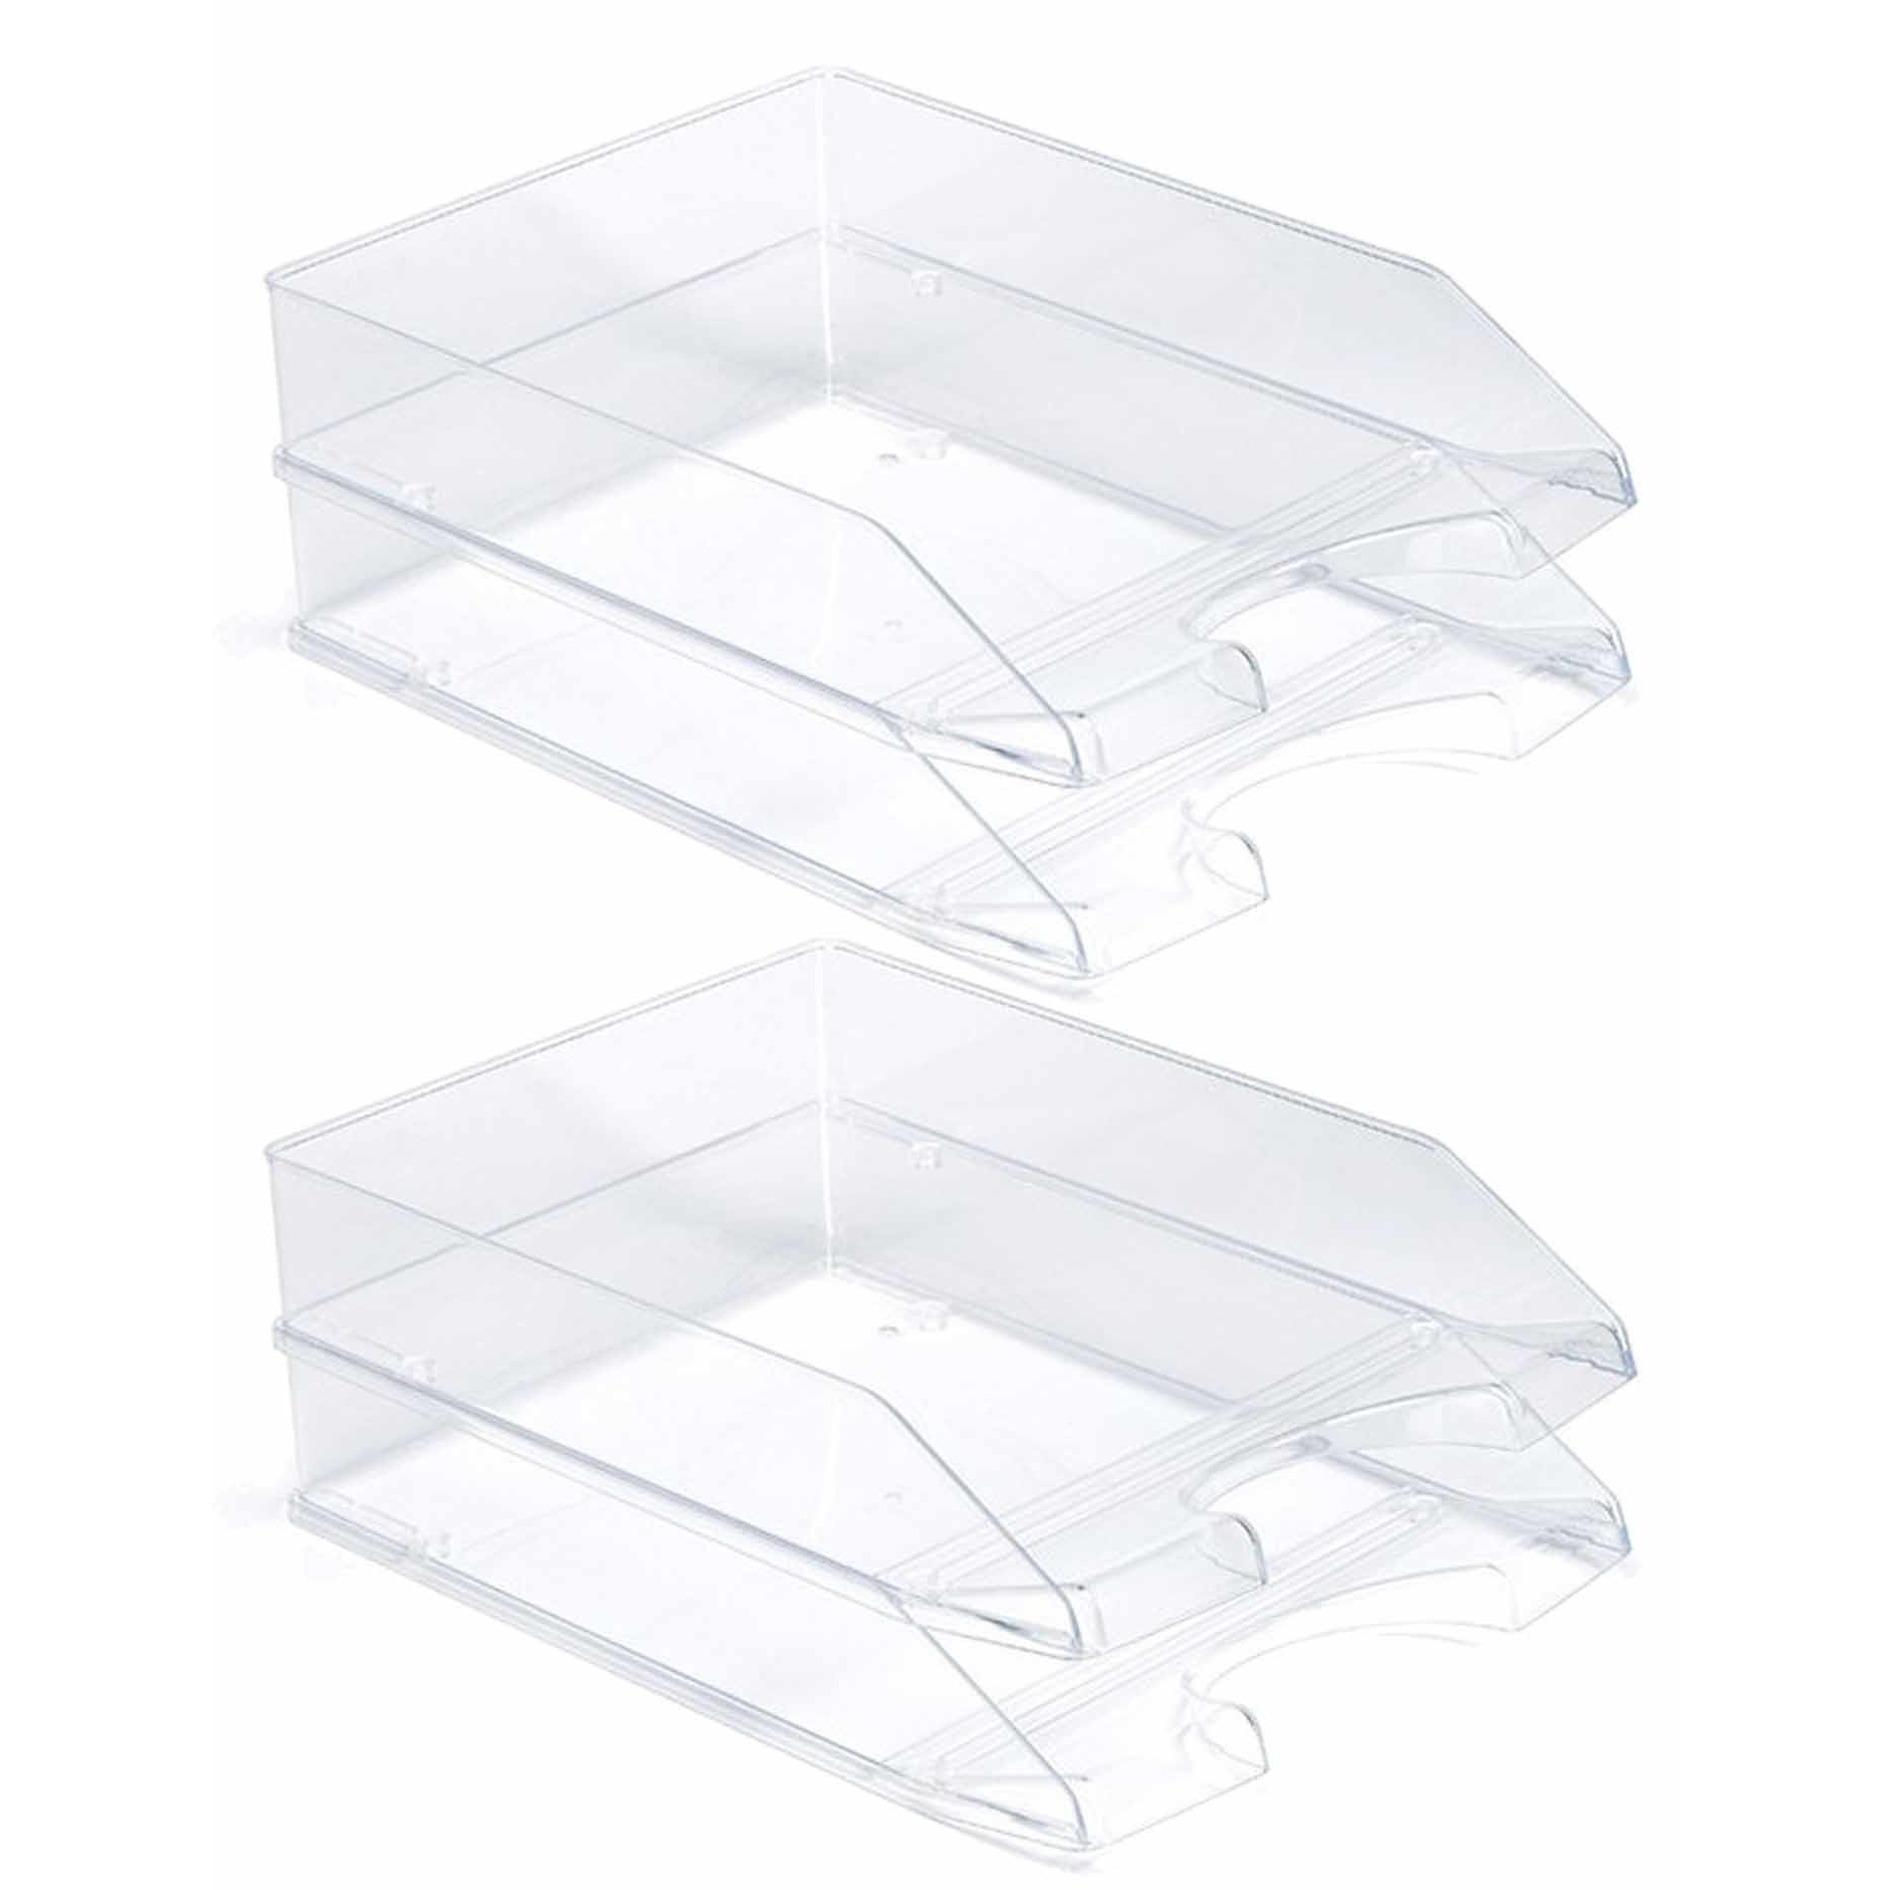 Pakket van 20x stuks postbakjejes transparant a4 formaat